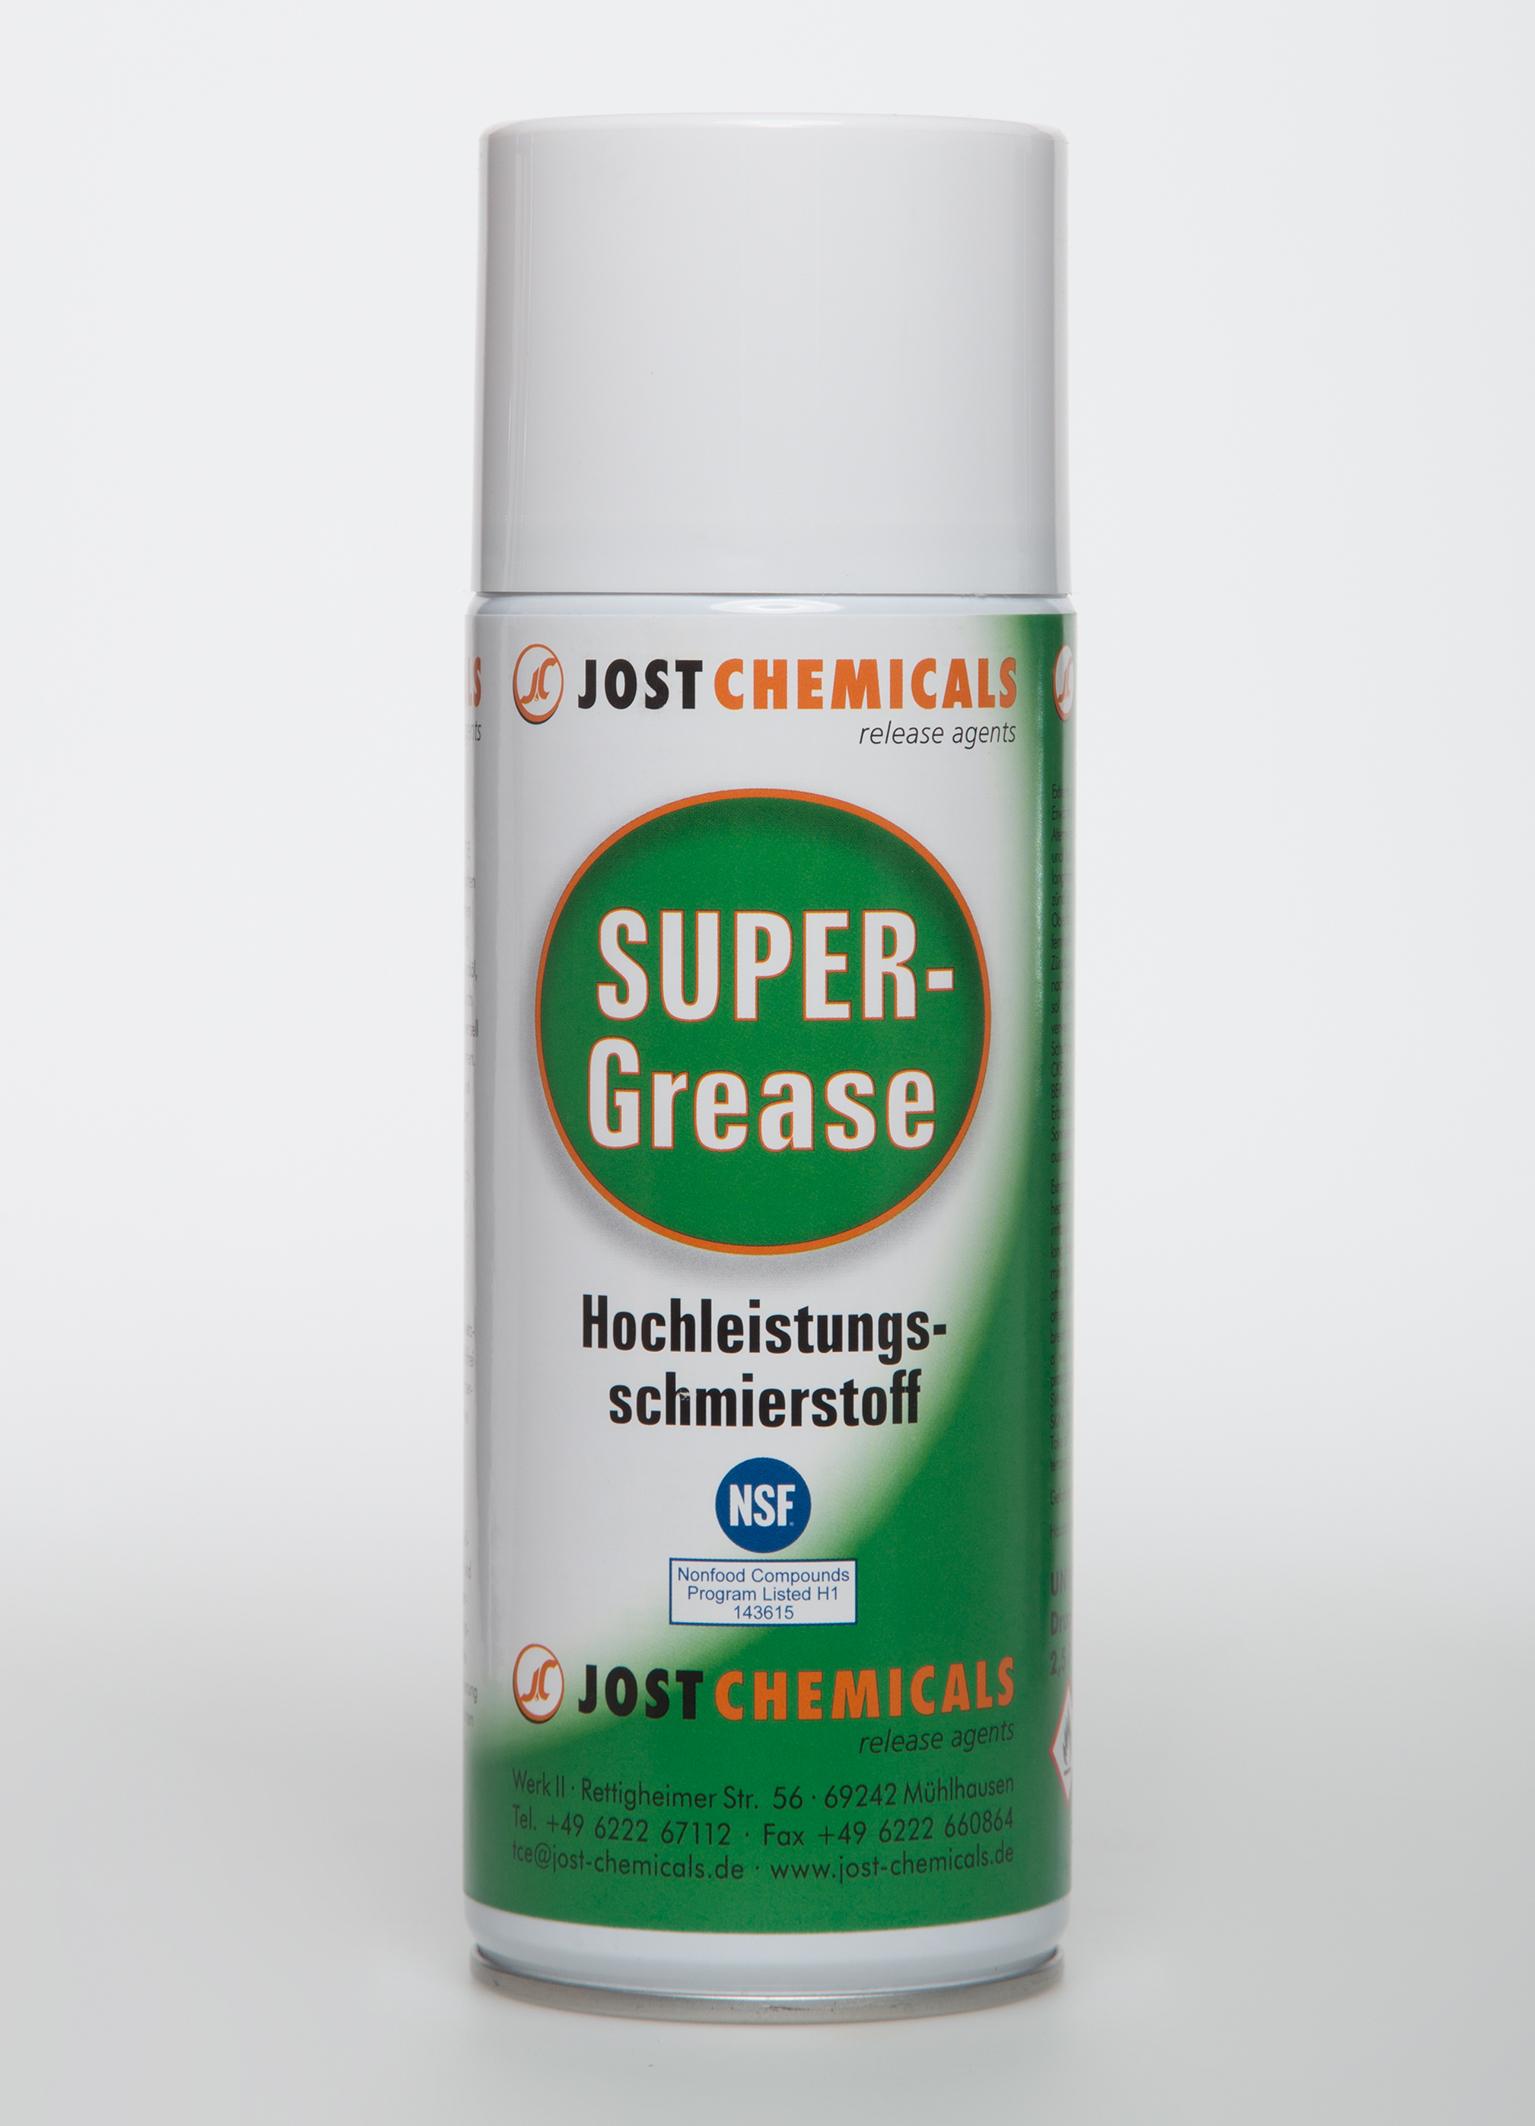 Super Grease - Schmierstoffe